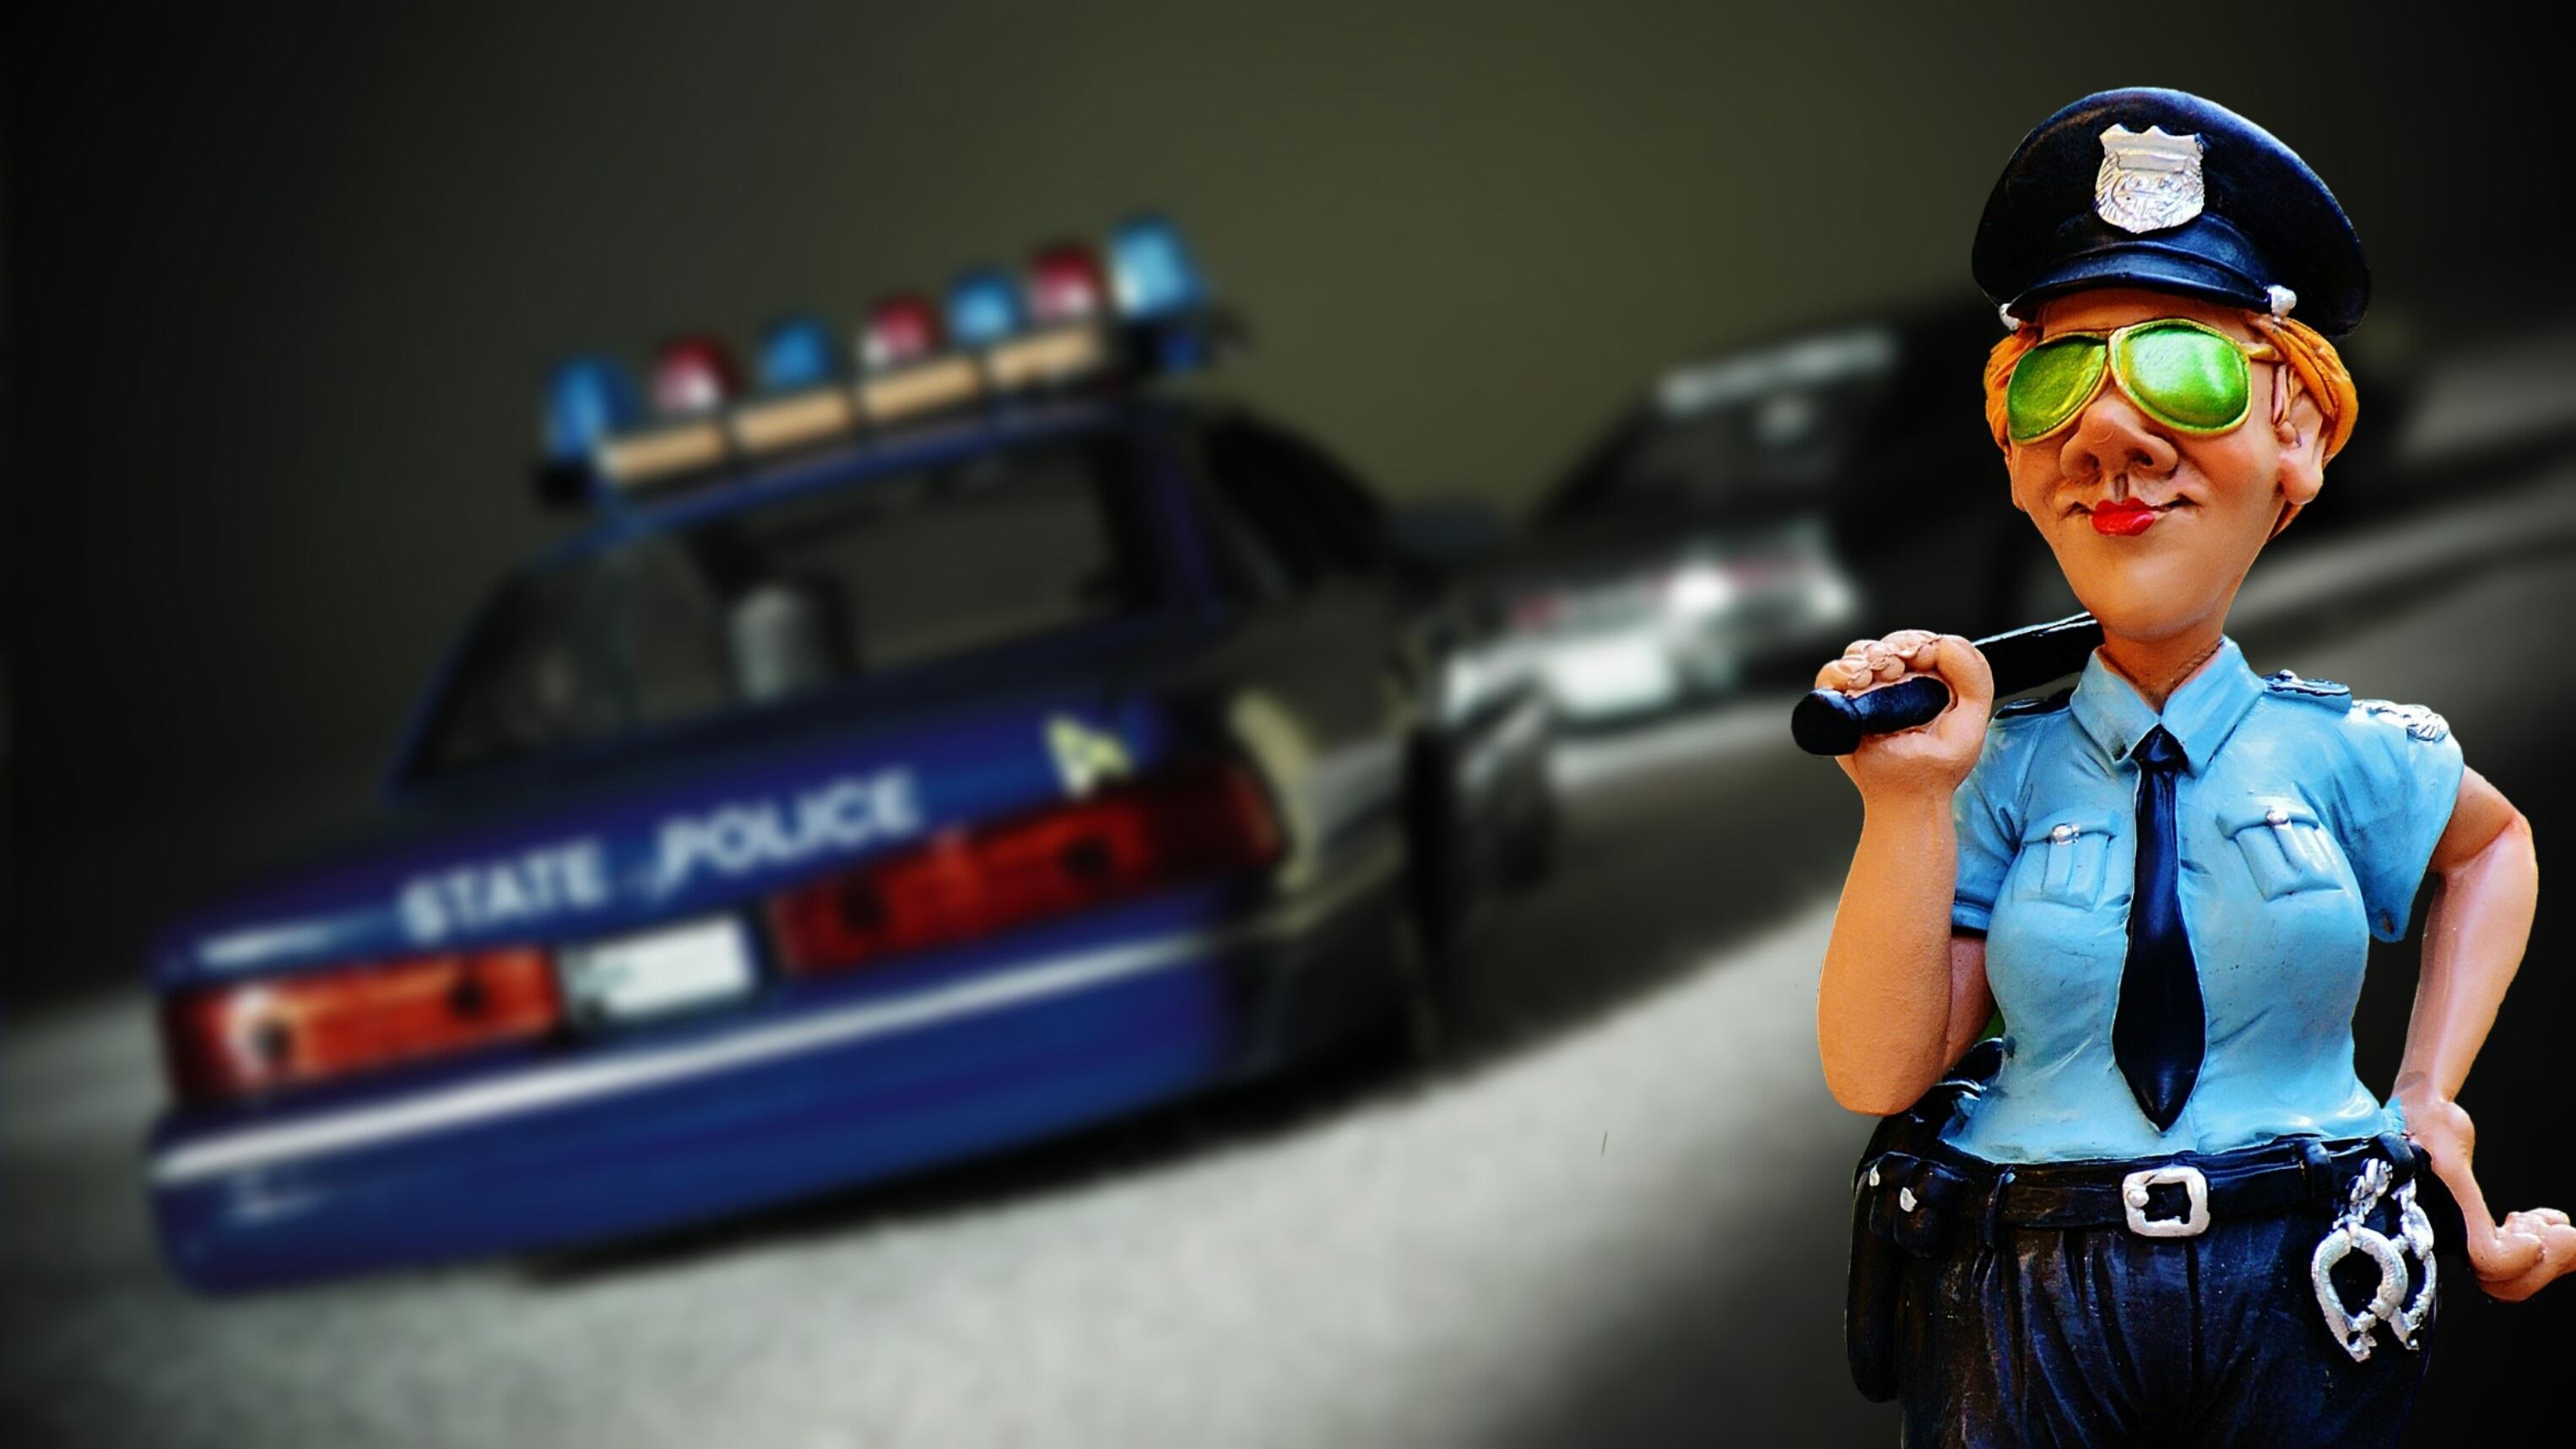 Gambar Orang Mobil Kendaraan Profesi Keamanan Pidana